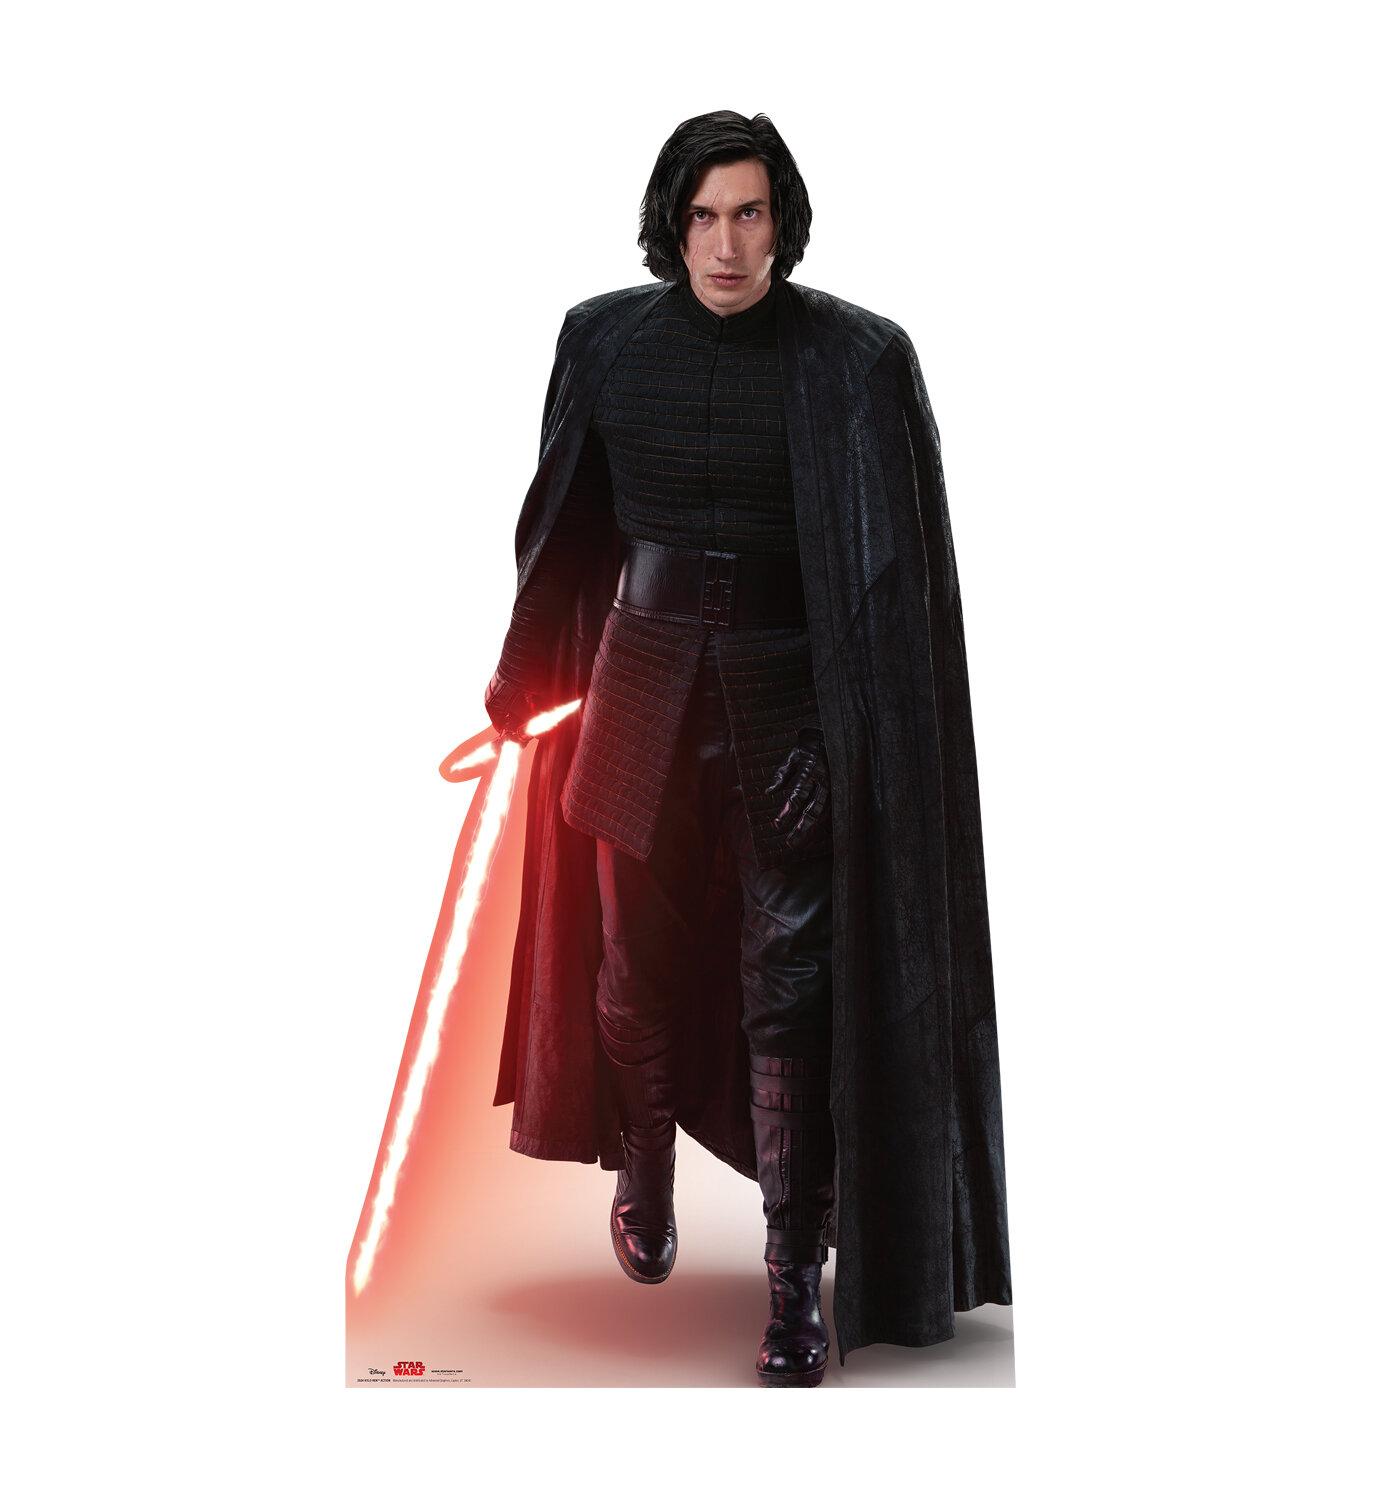 Advanced Graphics Star Wars Viii The Last Jedi Kylo Ren Action Cardboard Cutout Standup Reviews Wayfair